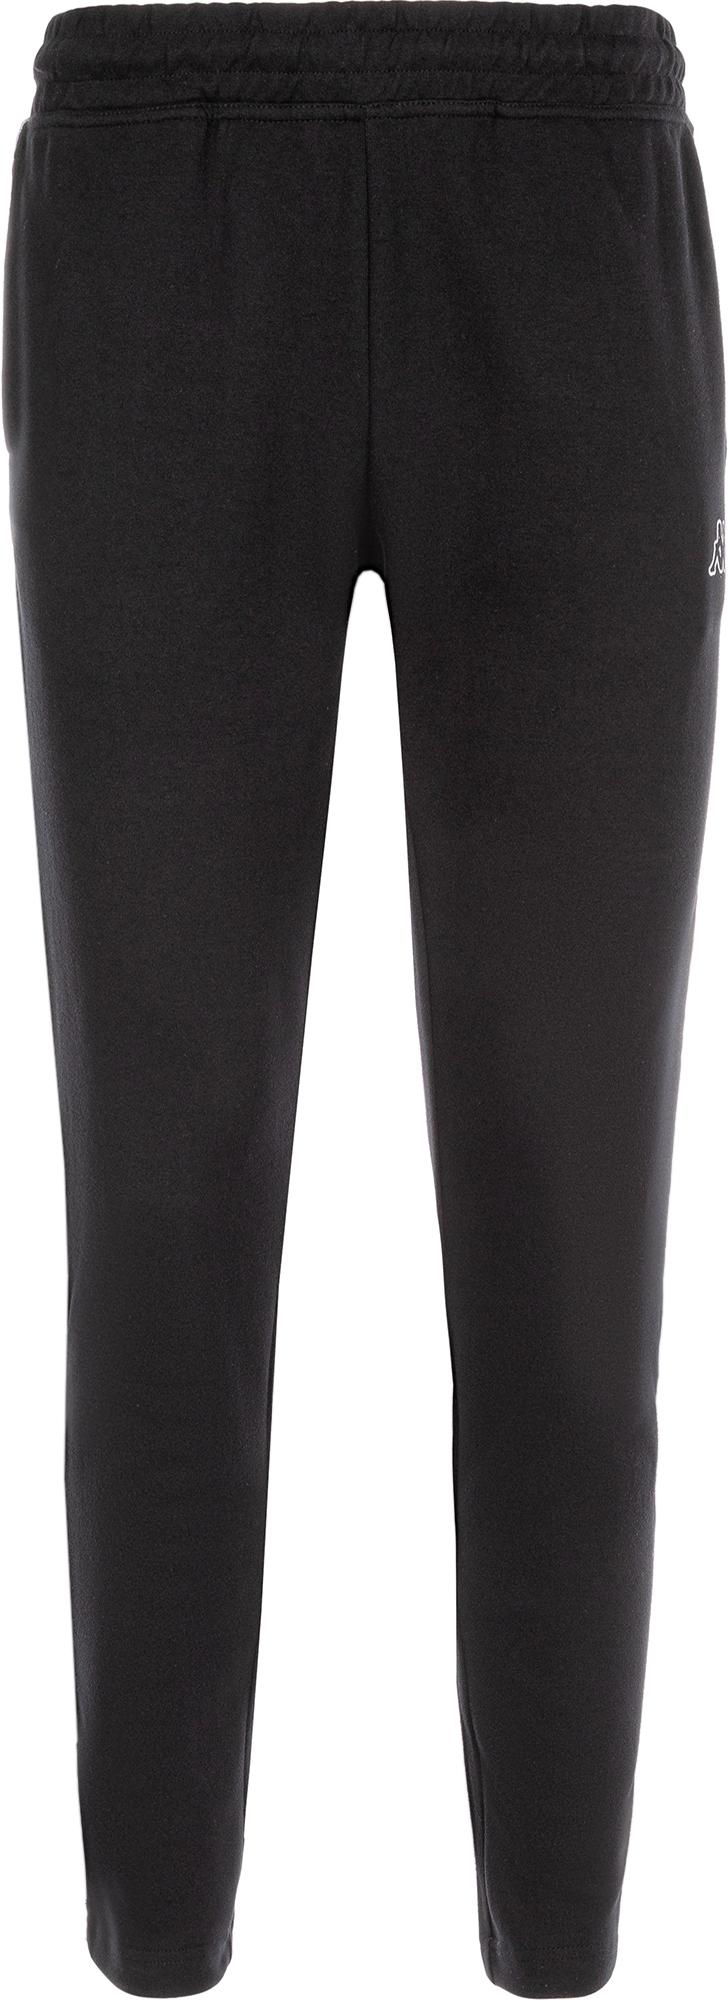 Фото - Kappa Брюки мужские Kappa, размер 48 брюки мужские kappa men s trousers цвет графитовый 304jr00 3a размер xl 52